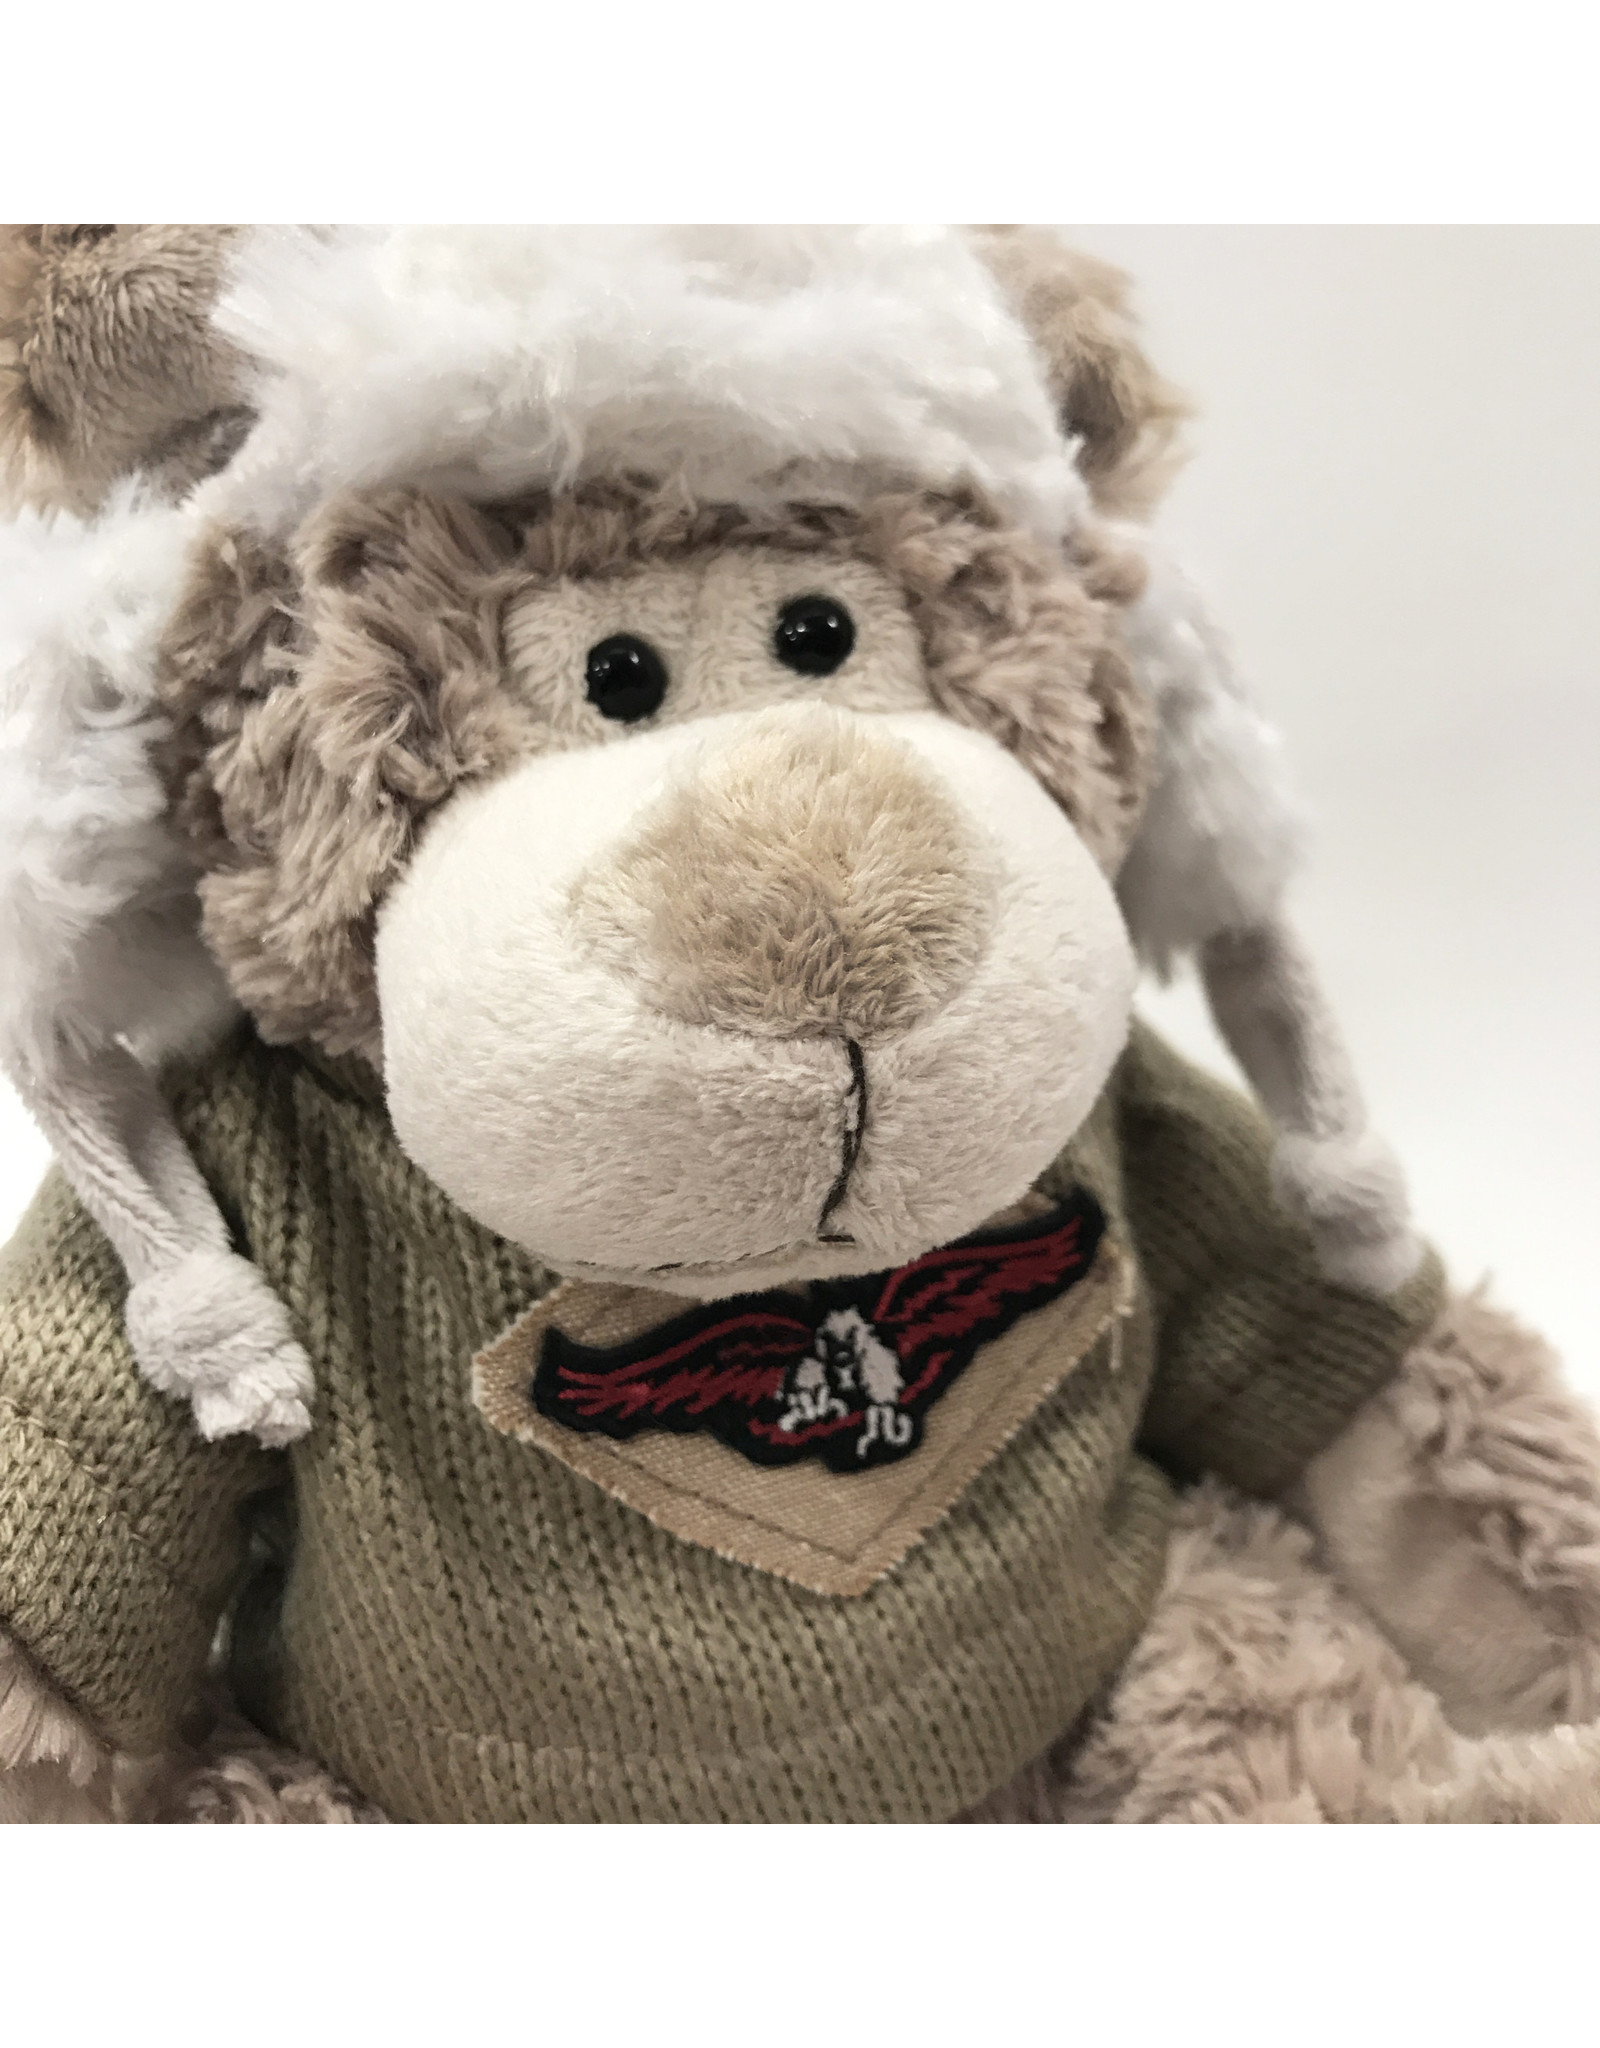 Mascot Factory PLUSH BEAR - NORDIC 8